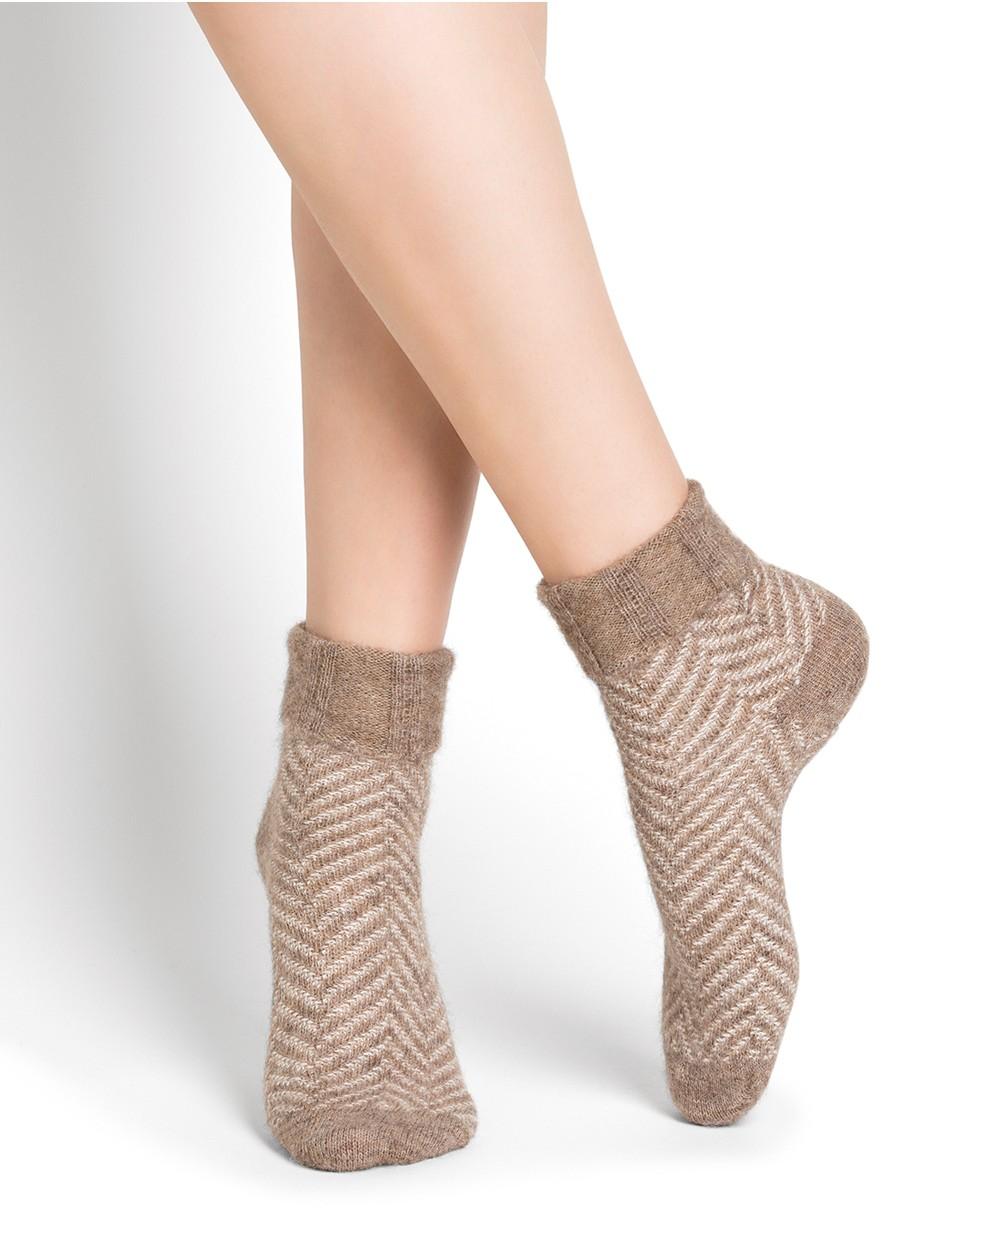 Chaussettes alpaga à revers motifs chevrons